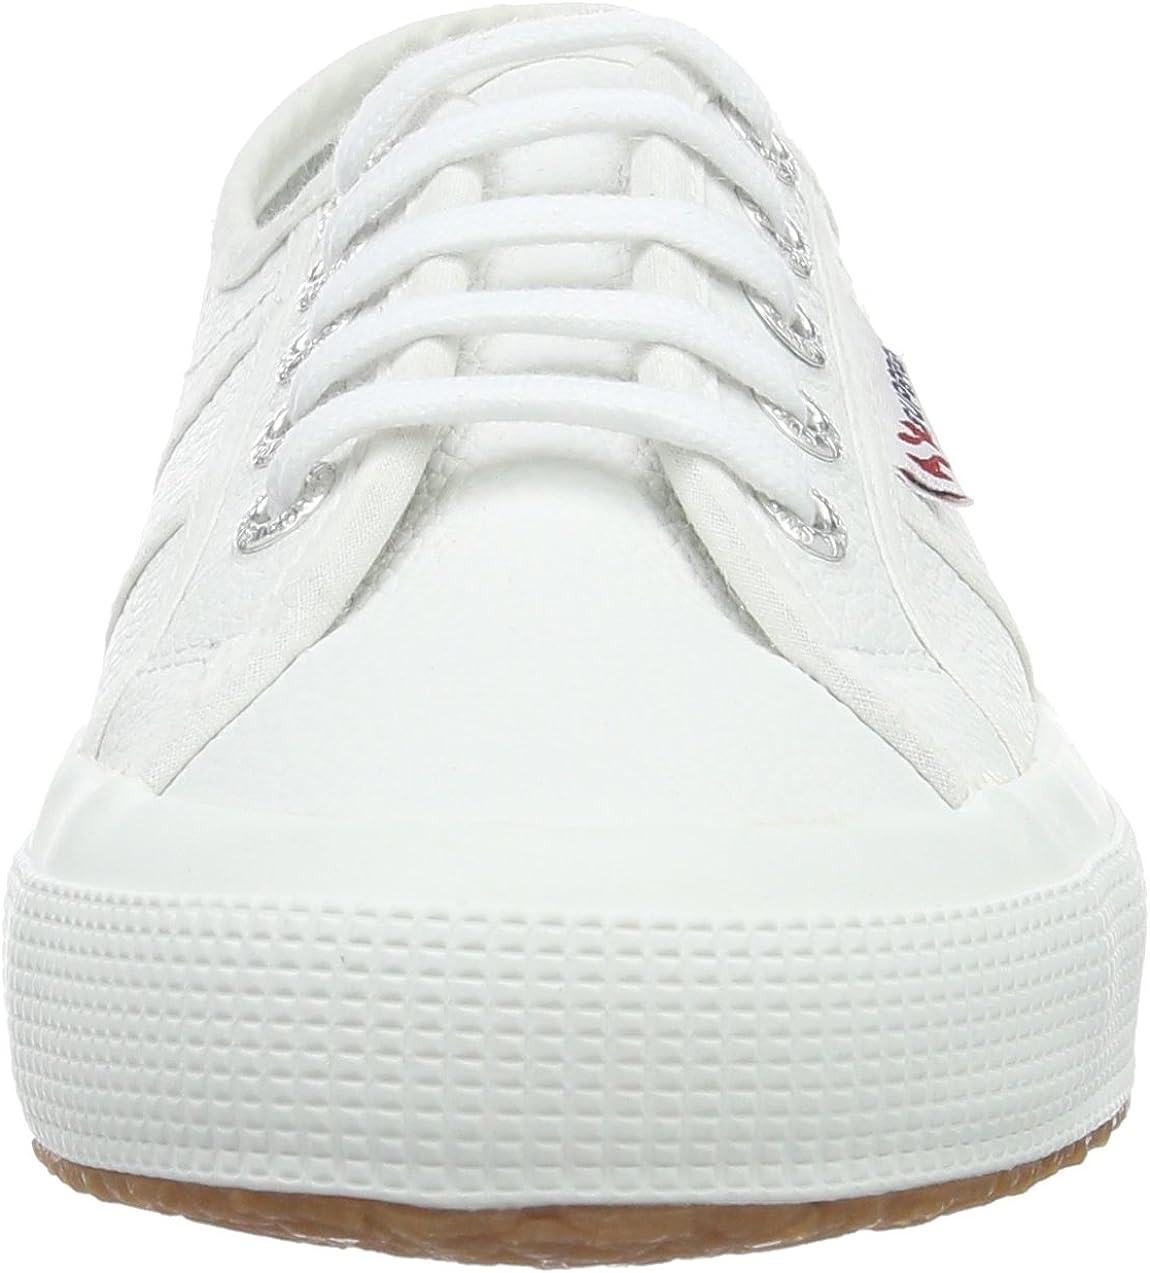 US 8.5 900 Superga Womens Low-Top White